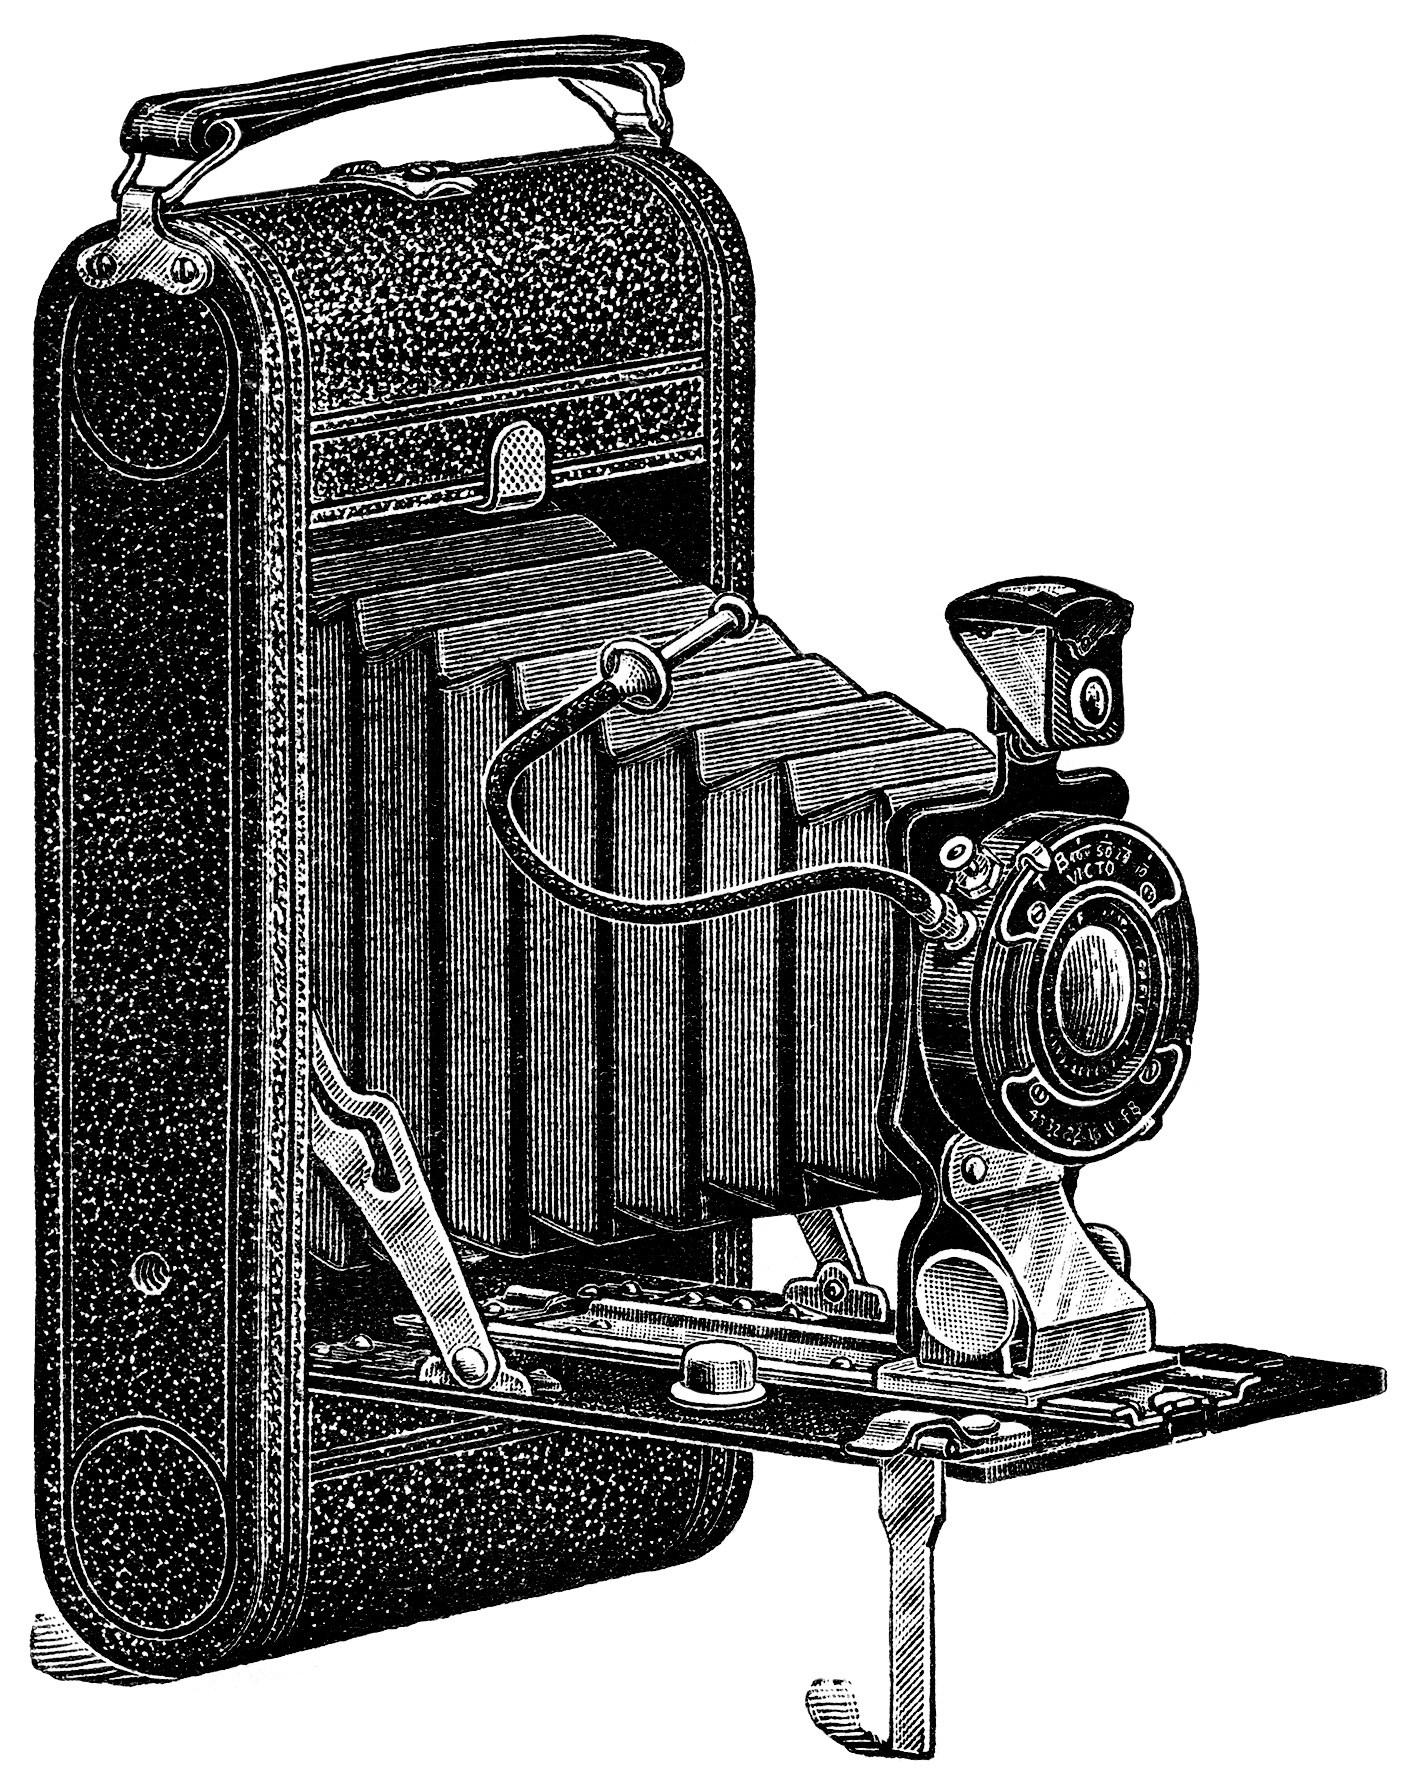 Free Vintage Camera Clipart Image.